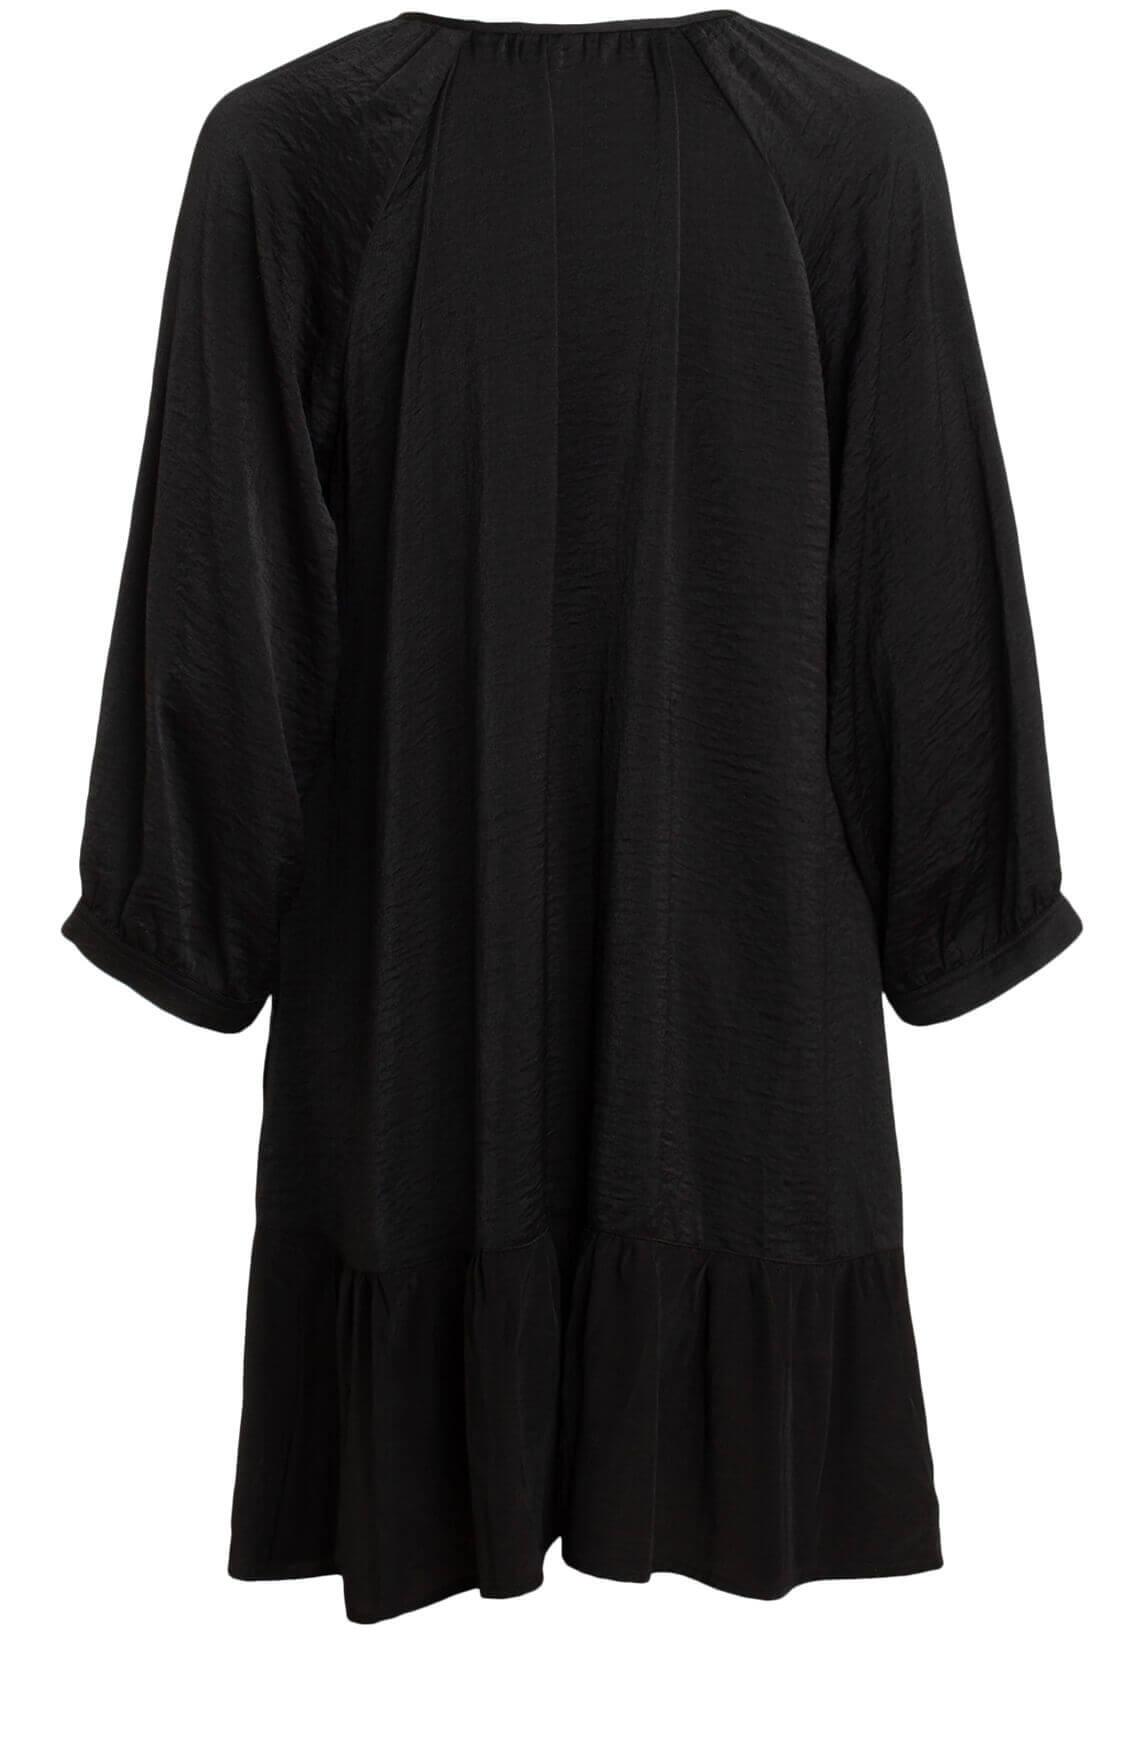 Co Couture Dames Elise jurk zwart